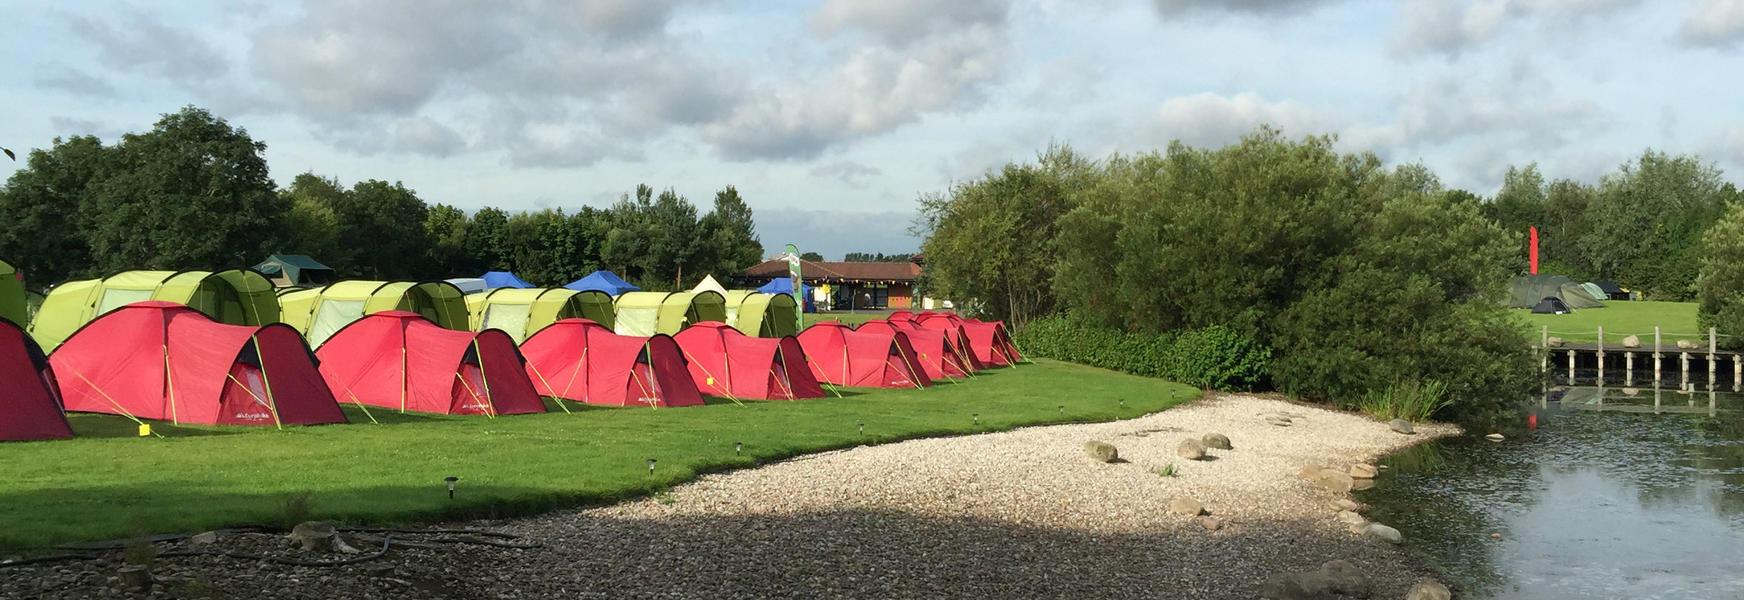 Edinburgh Festival Camping #1